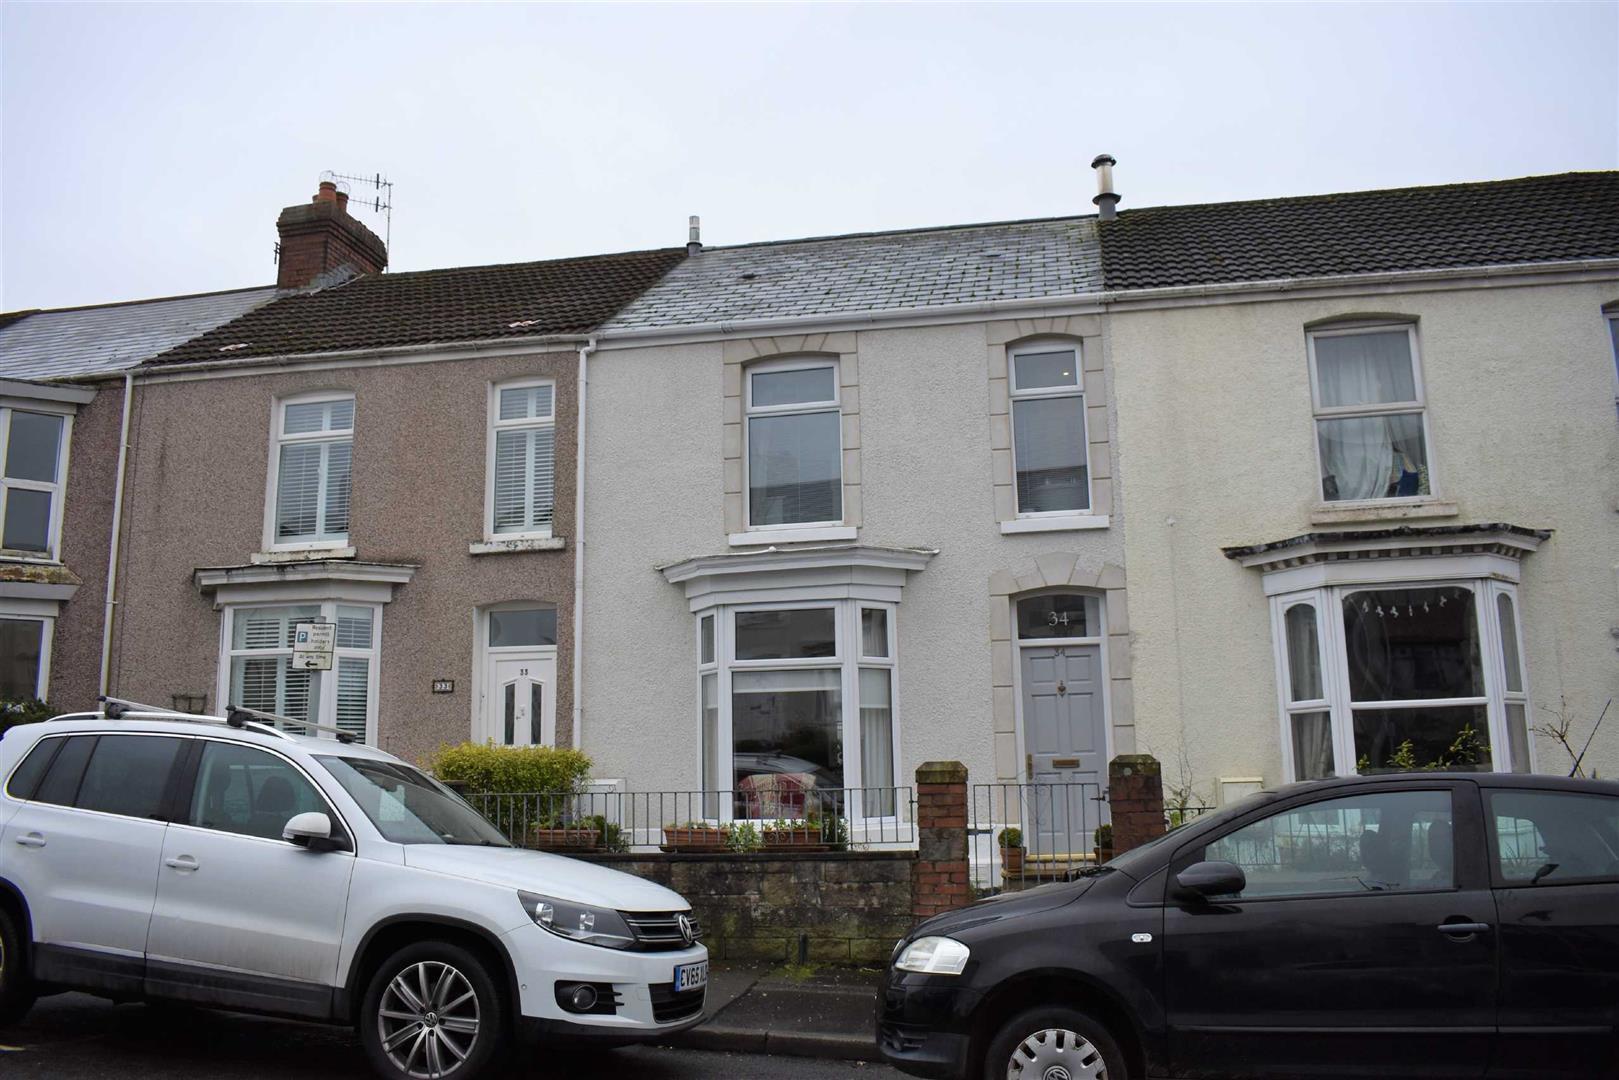 Coed Saeson Crescent, Sketty, Swansea, SA2 9DG